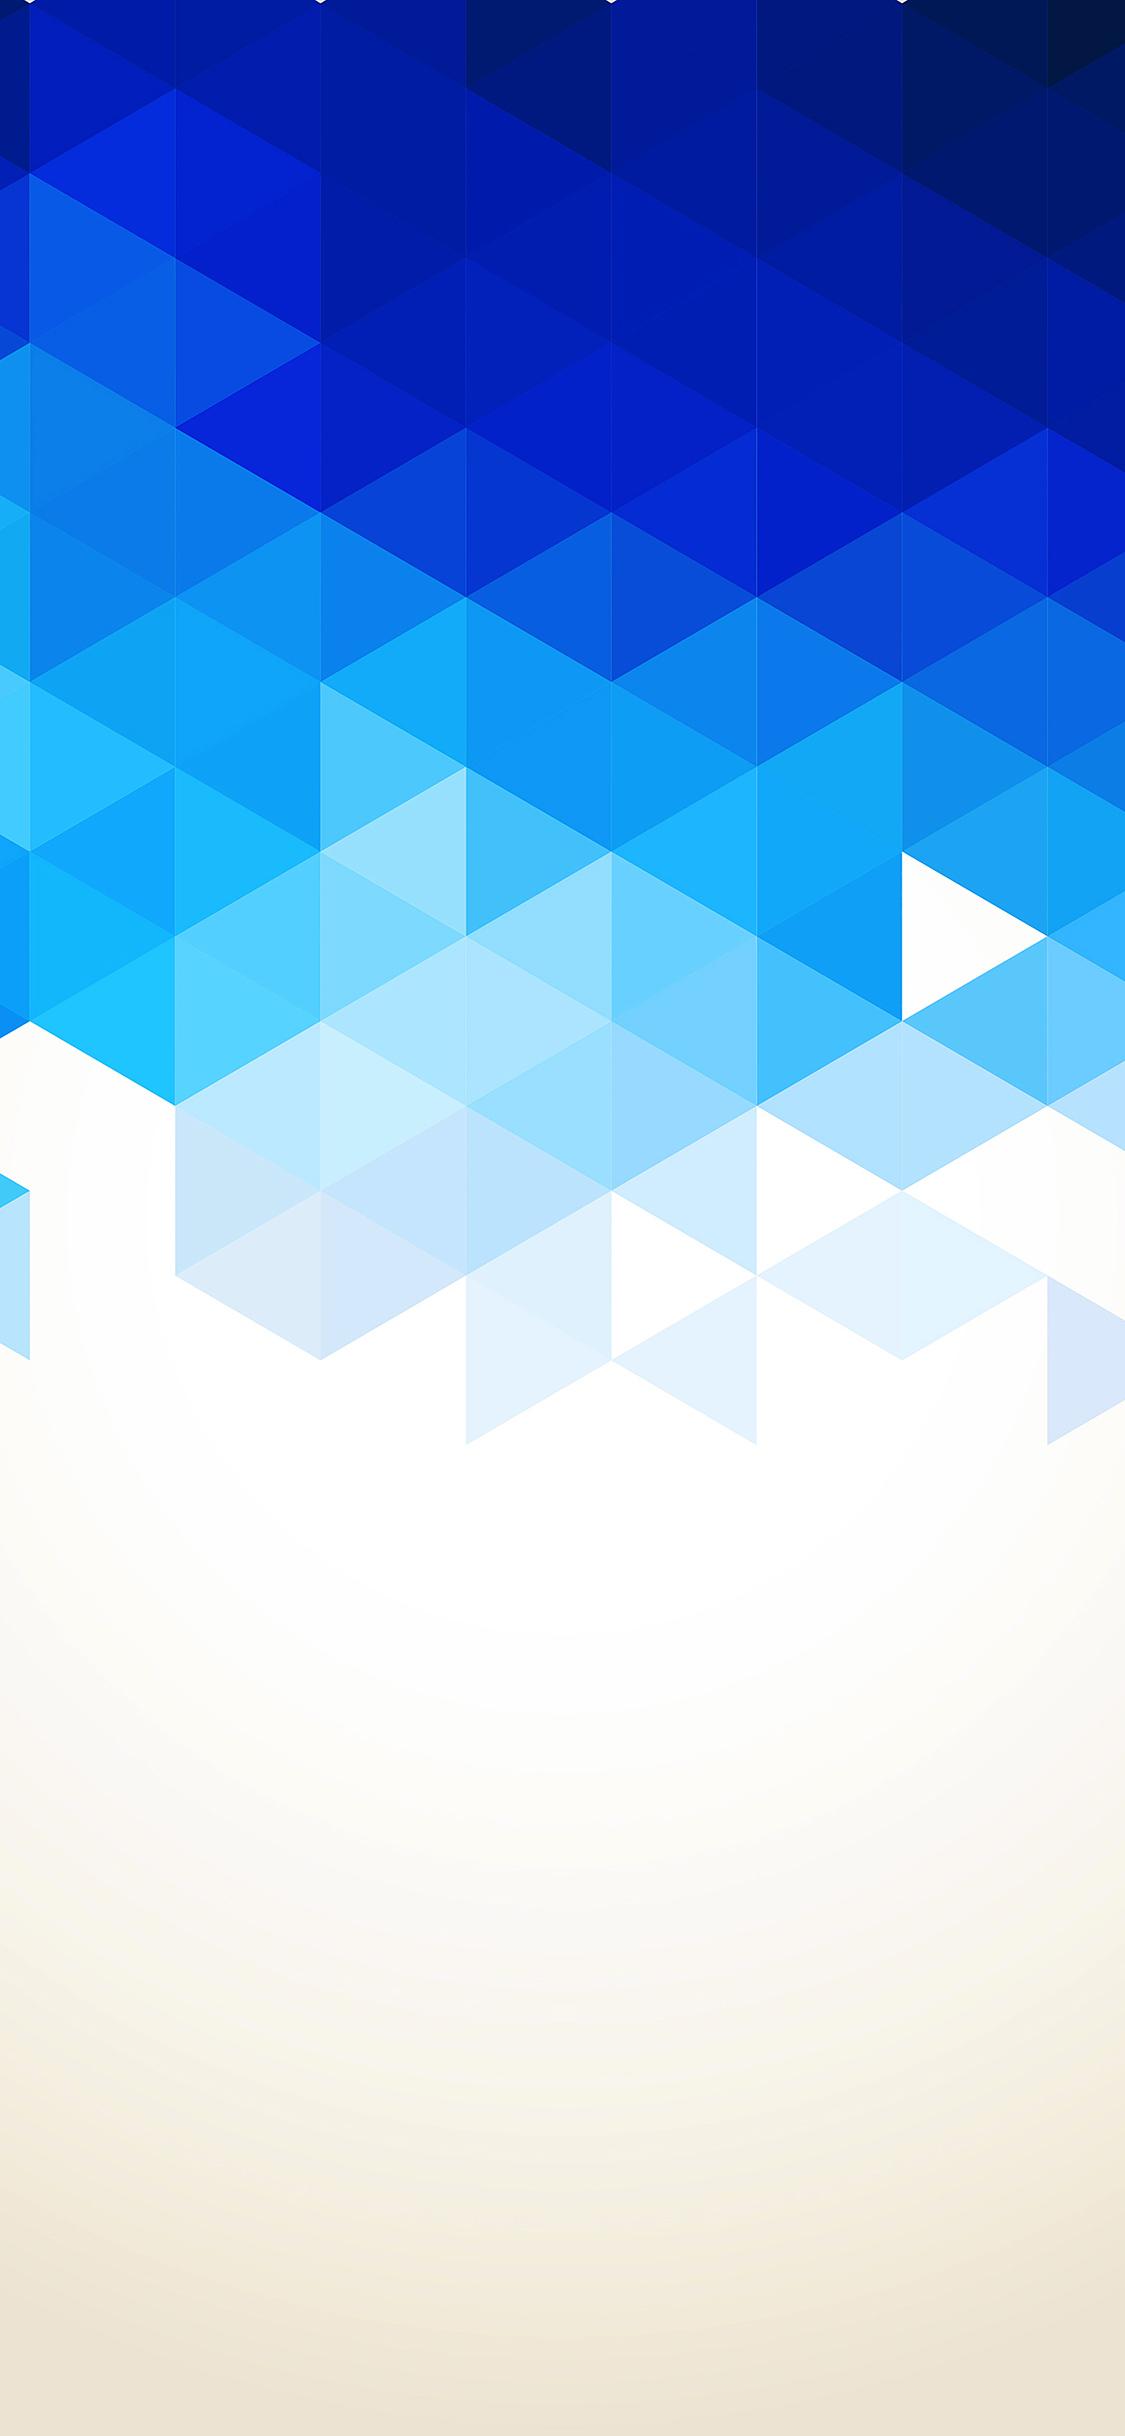 iPhoneXpapers.com-Apple-iPhone-wallpaper-va91-wallpaper-triangle-fall-blue-pattern